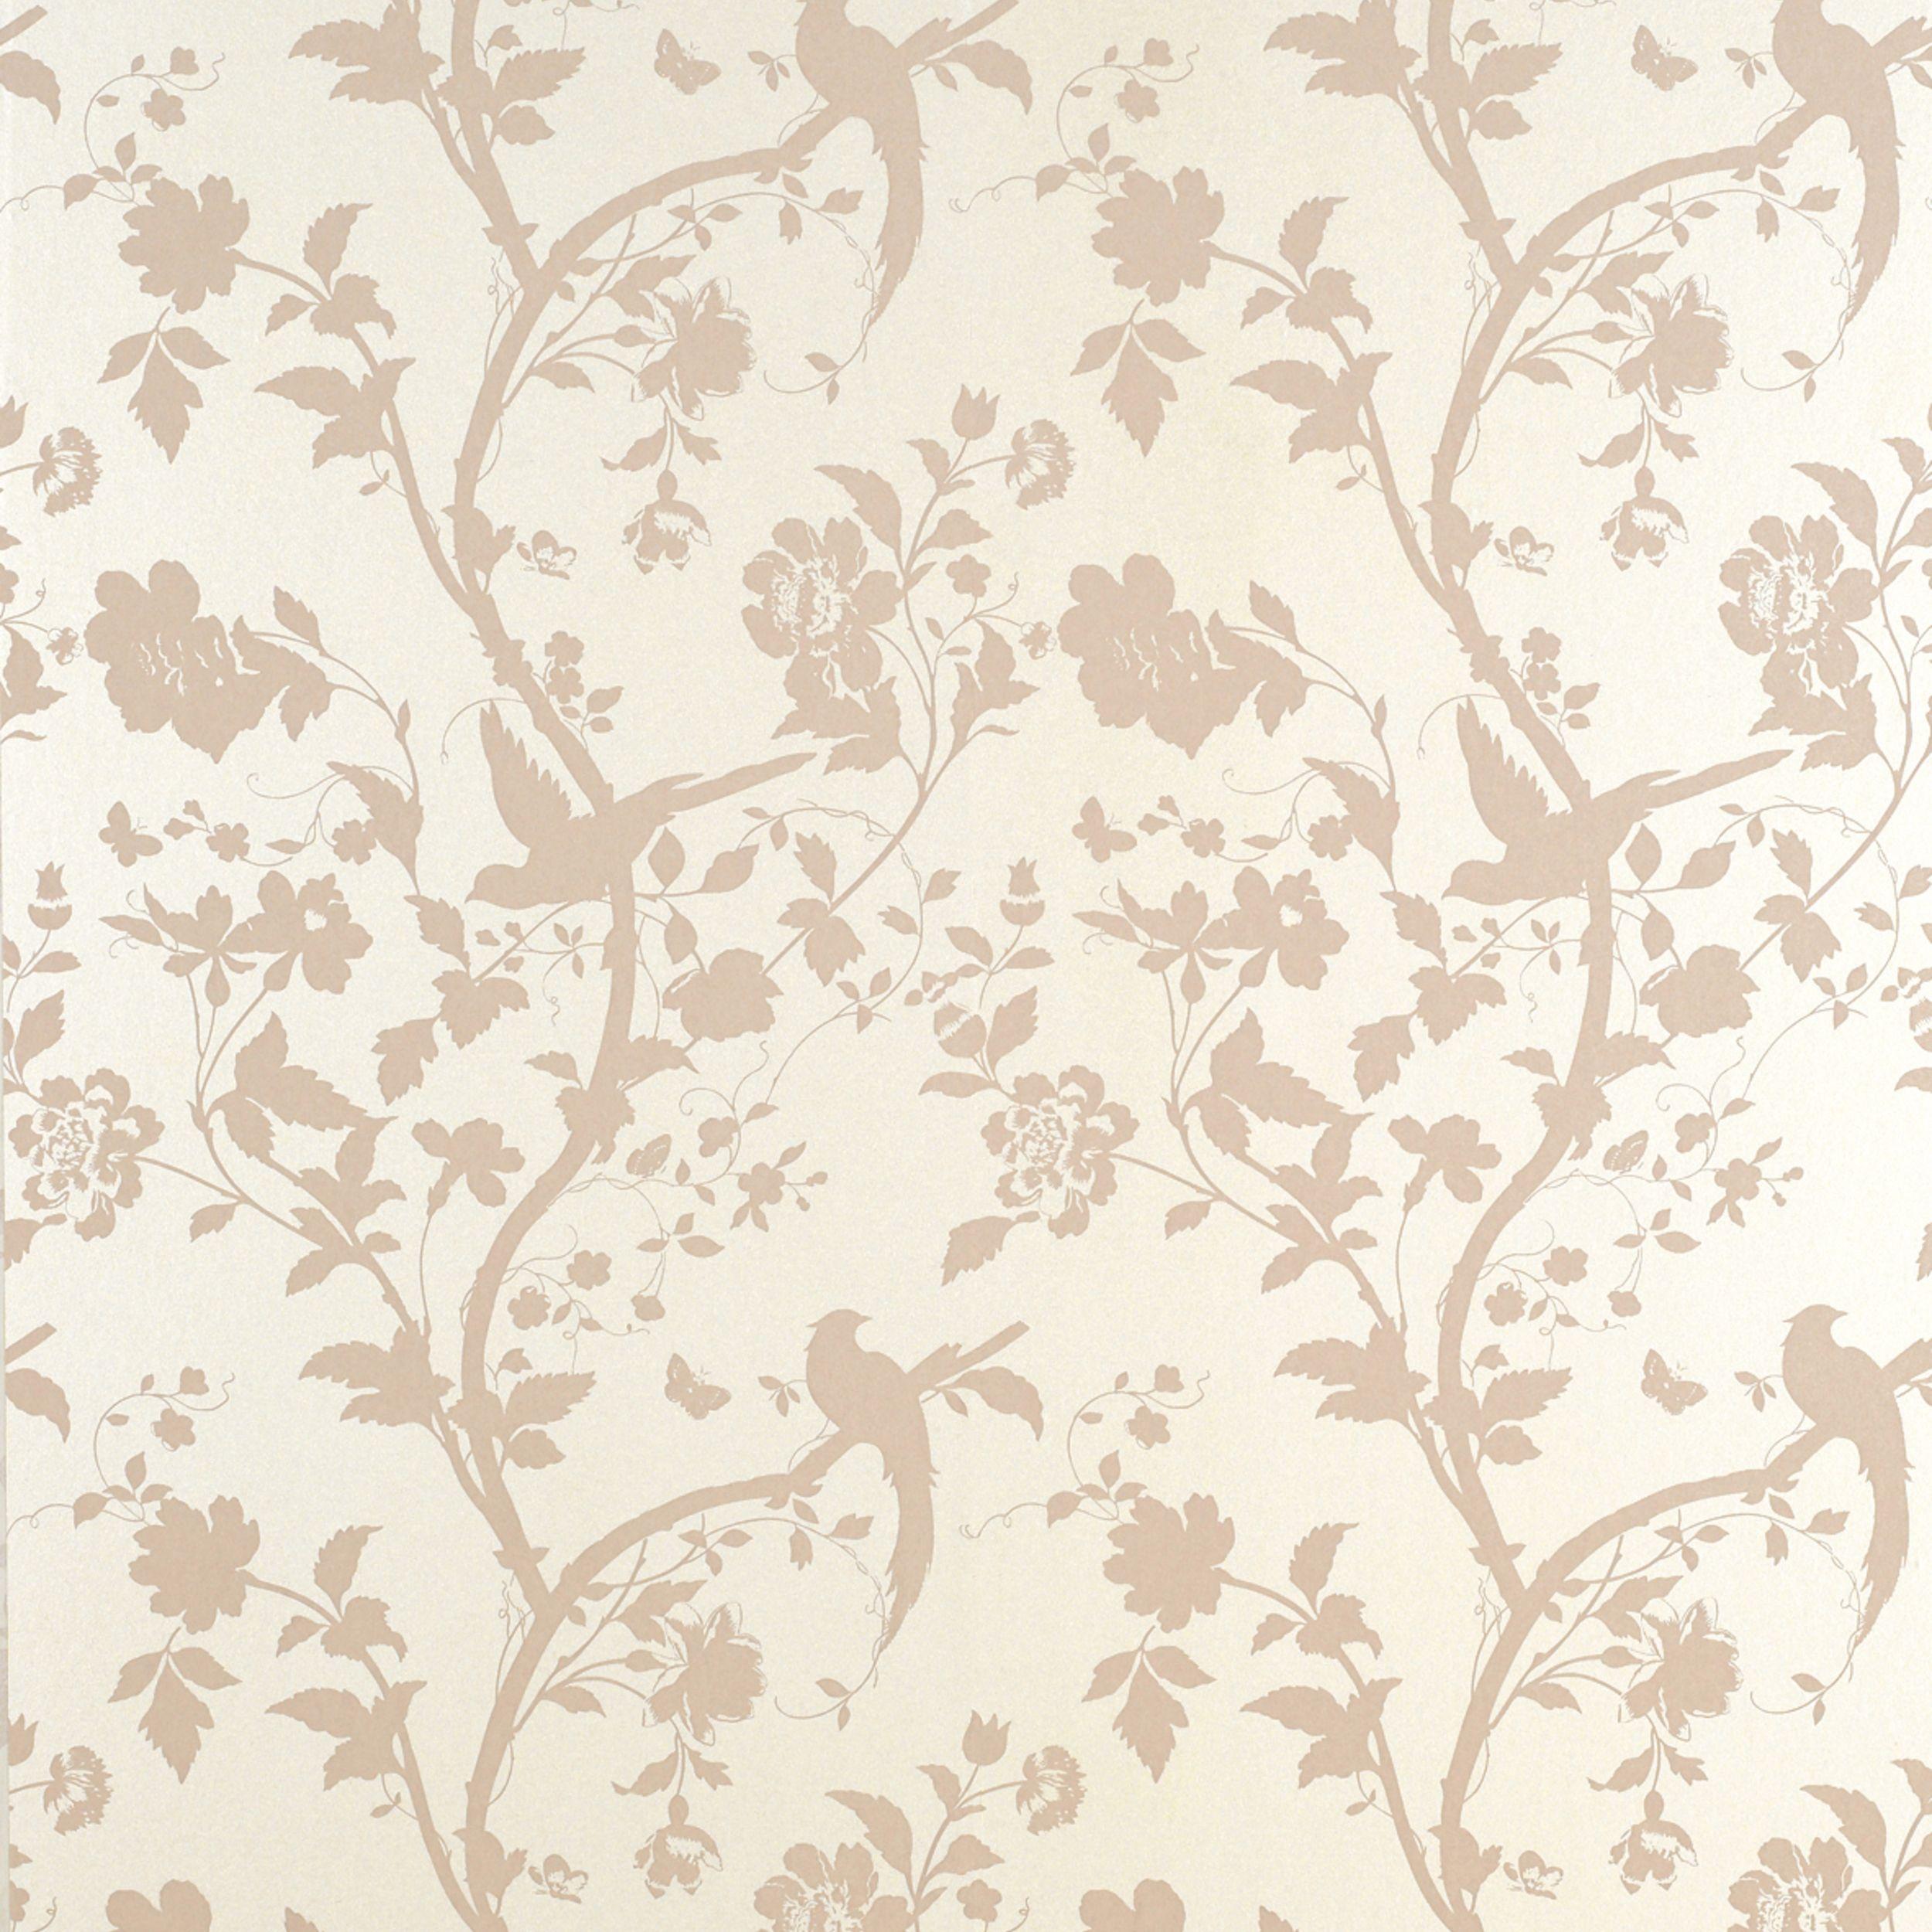 oriental garden chalk pink floral wallpaper floral wallpapers laura ashley and oriental. Black Bedroom Furniture Sets. Home Design Ideas